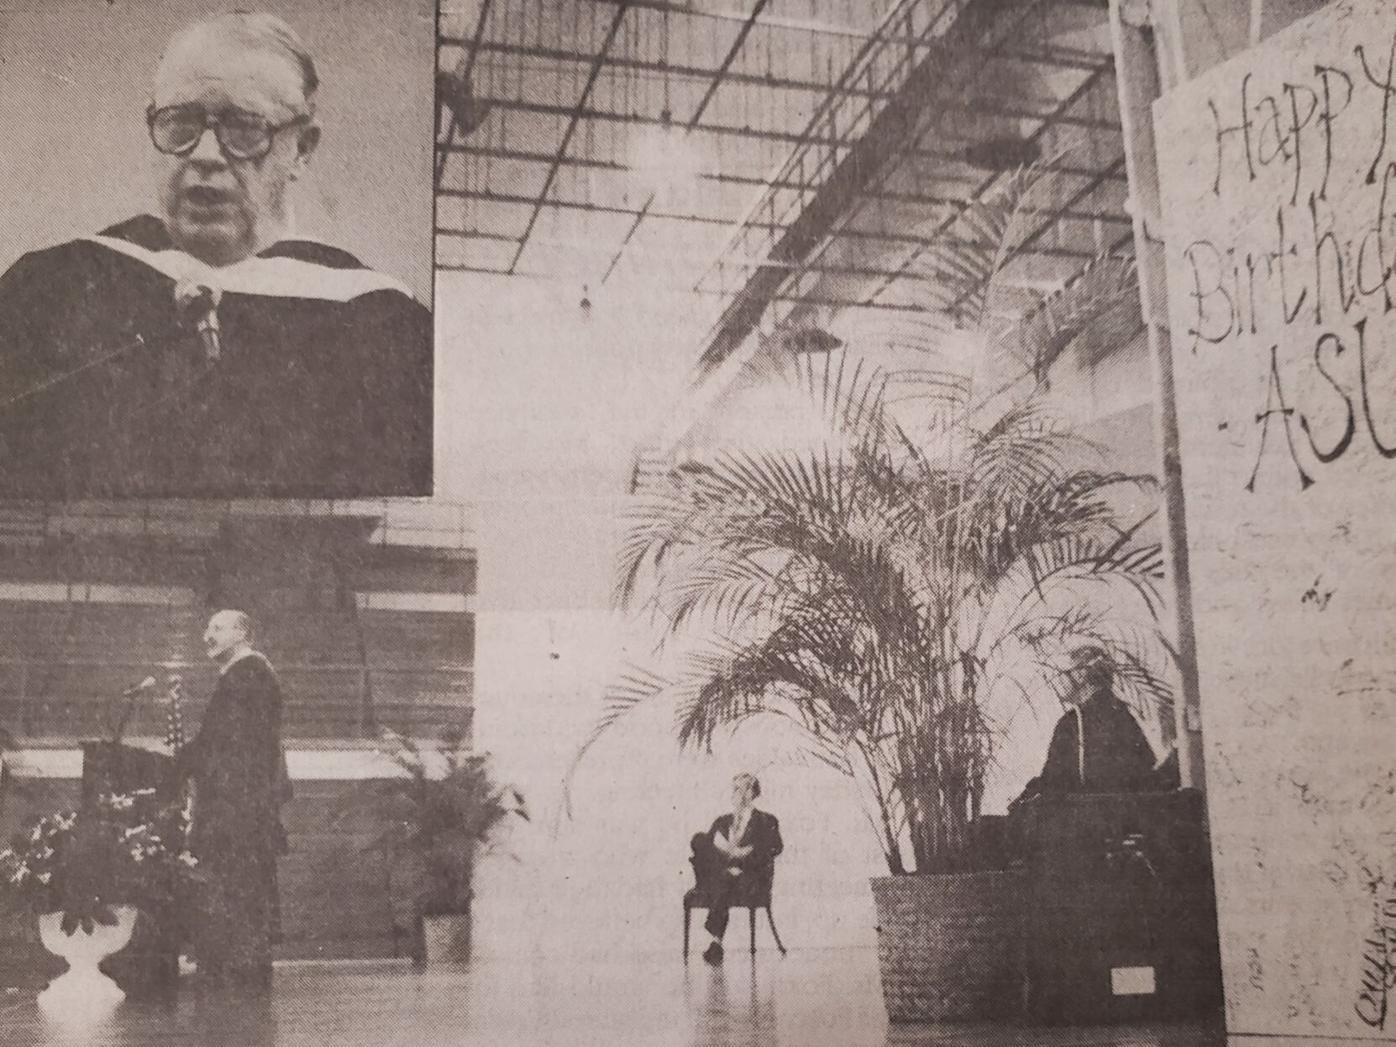 1991 convocation